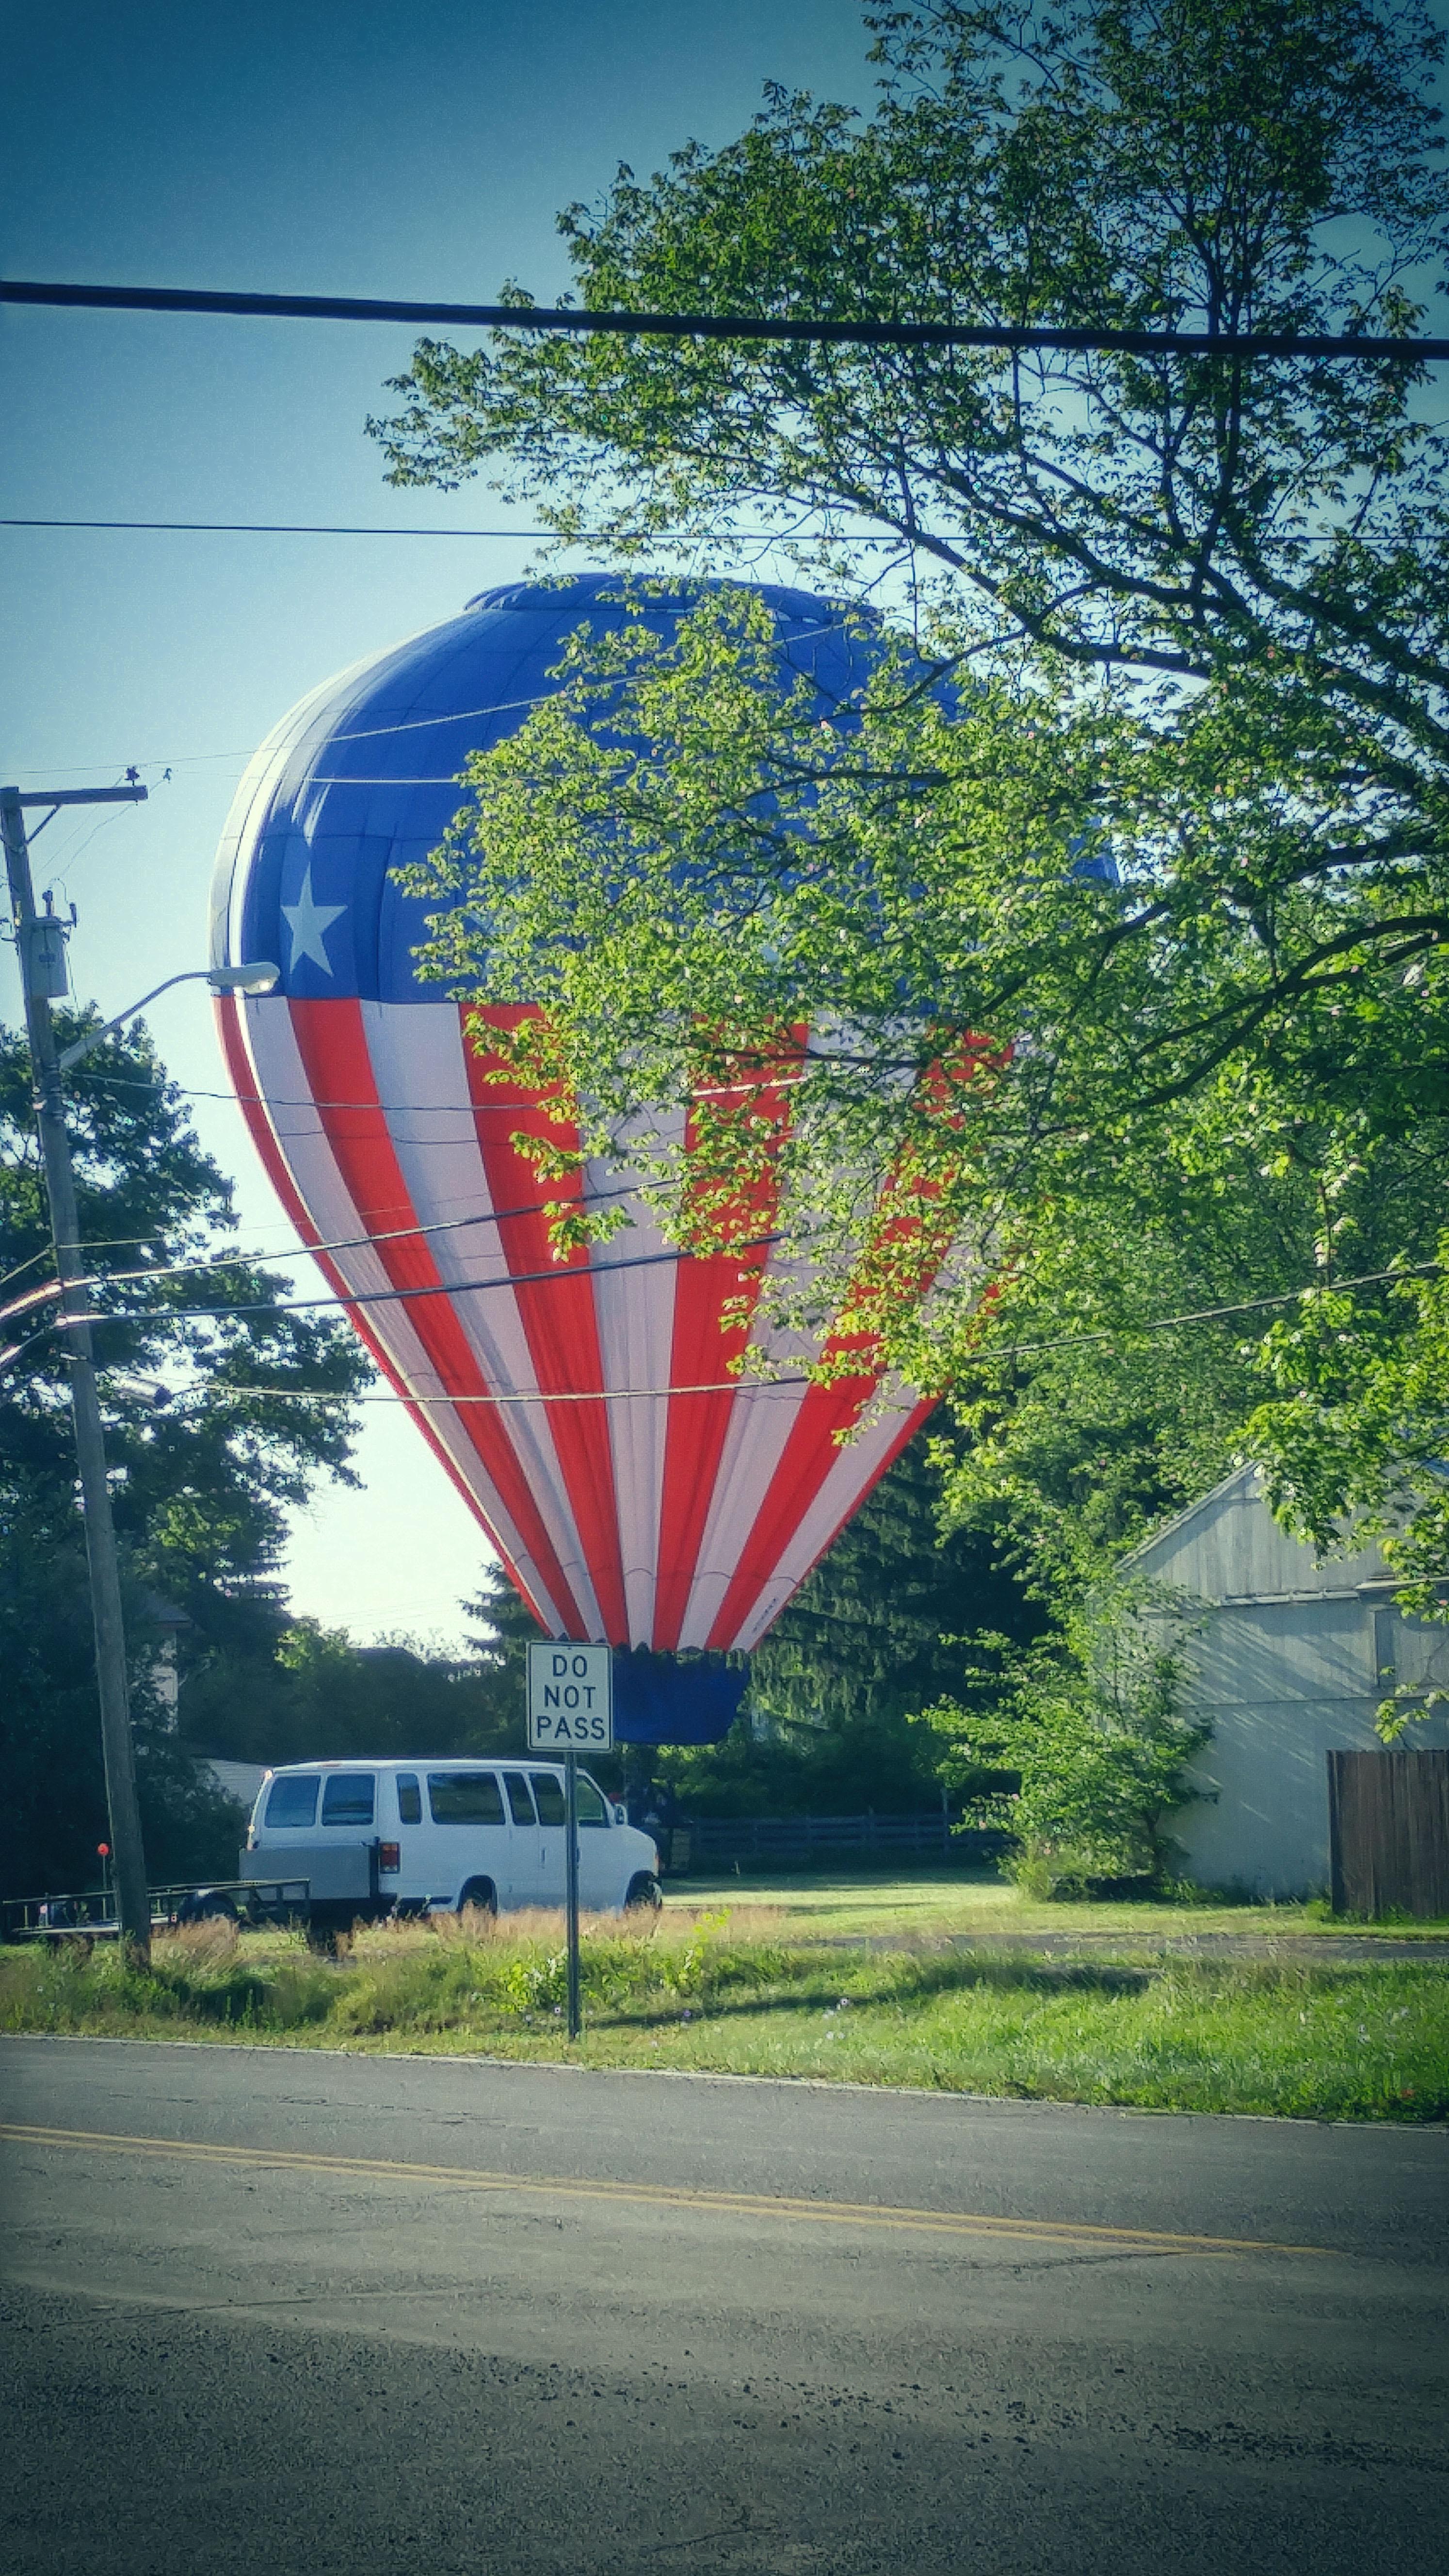 Hot Air Balloon perfect crash landing